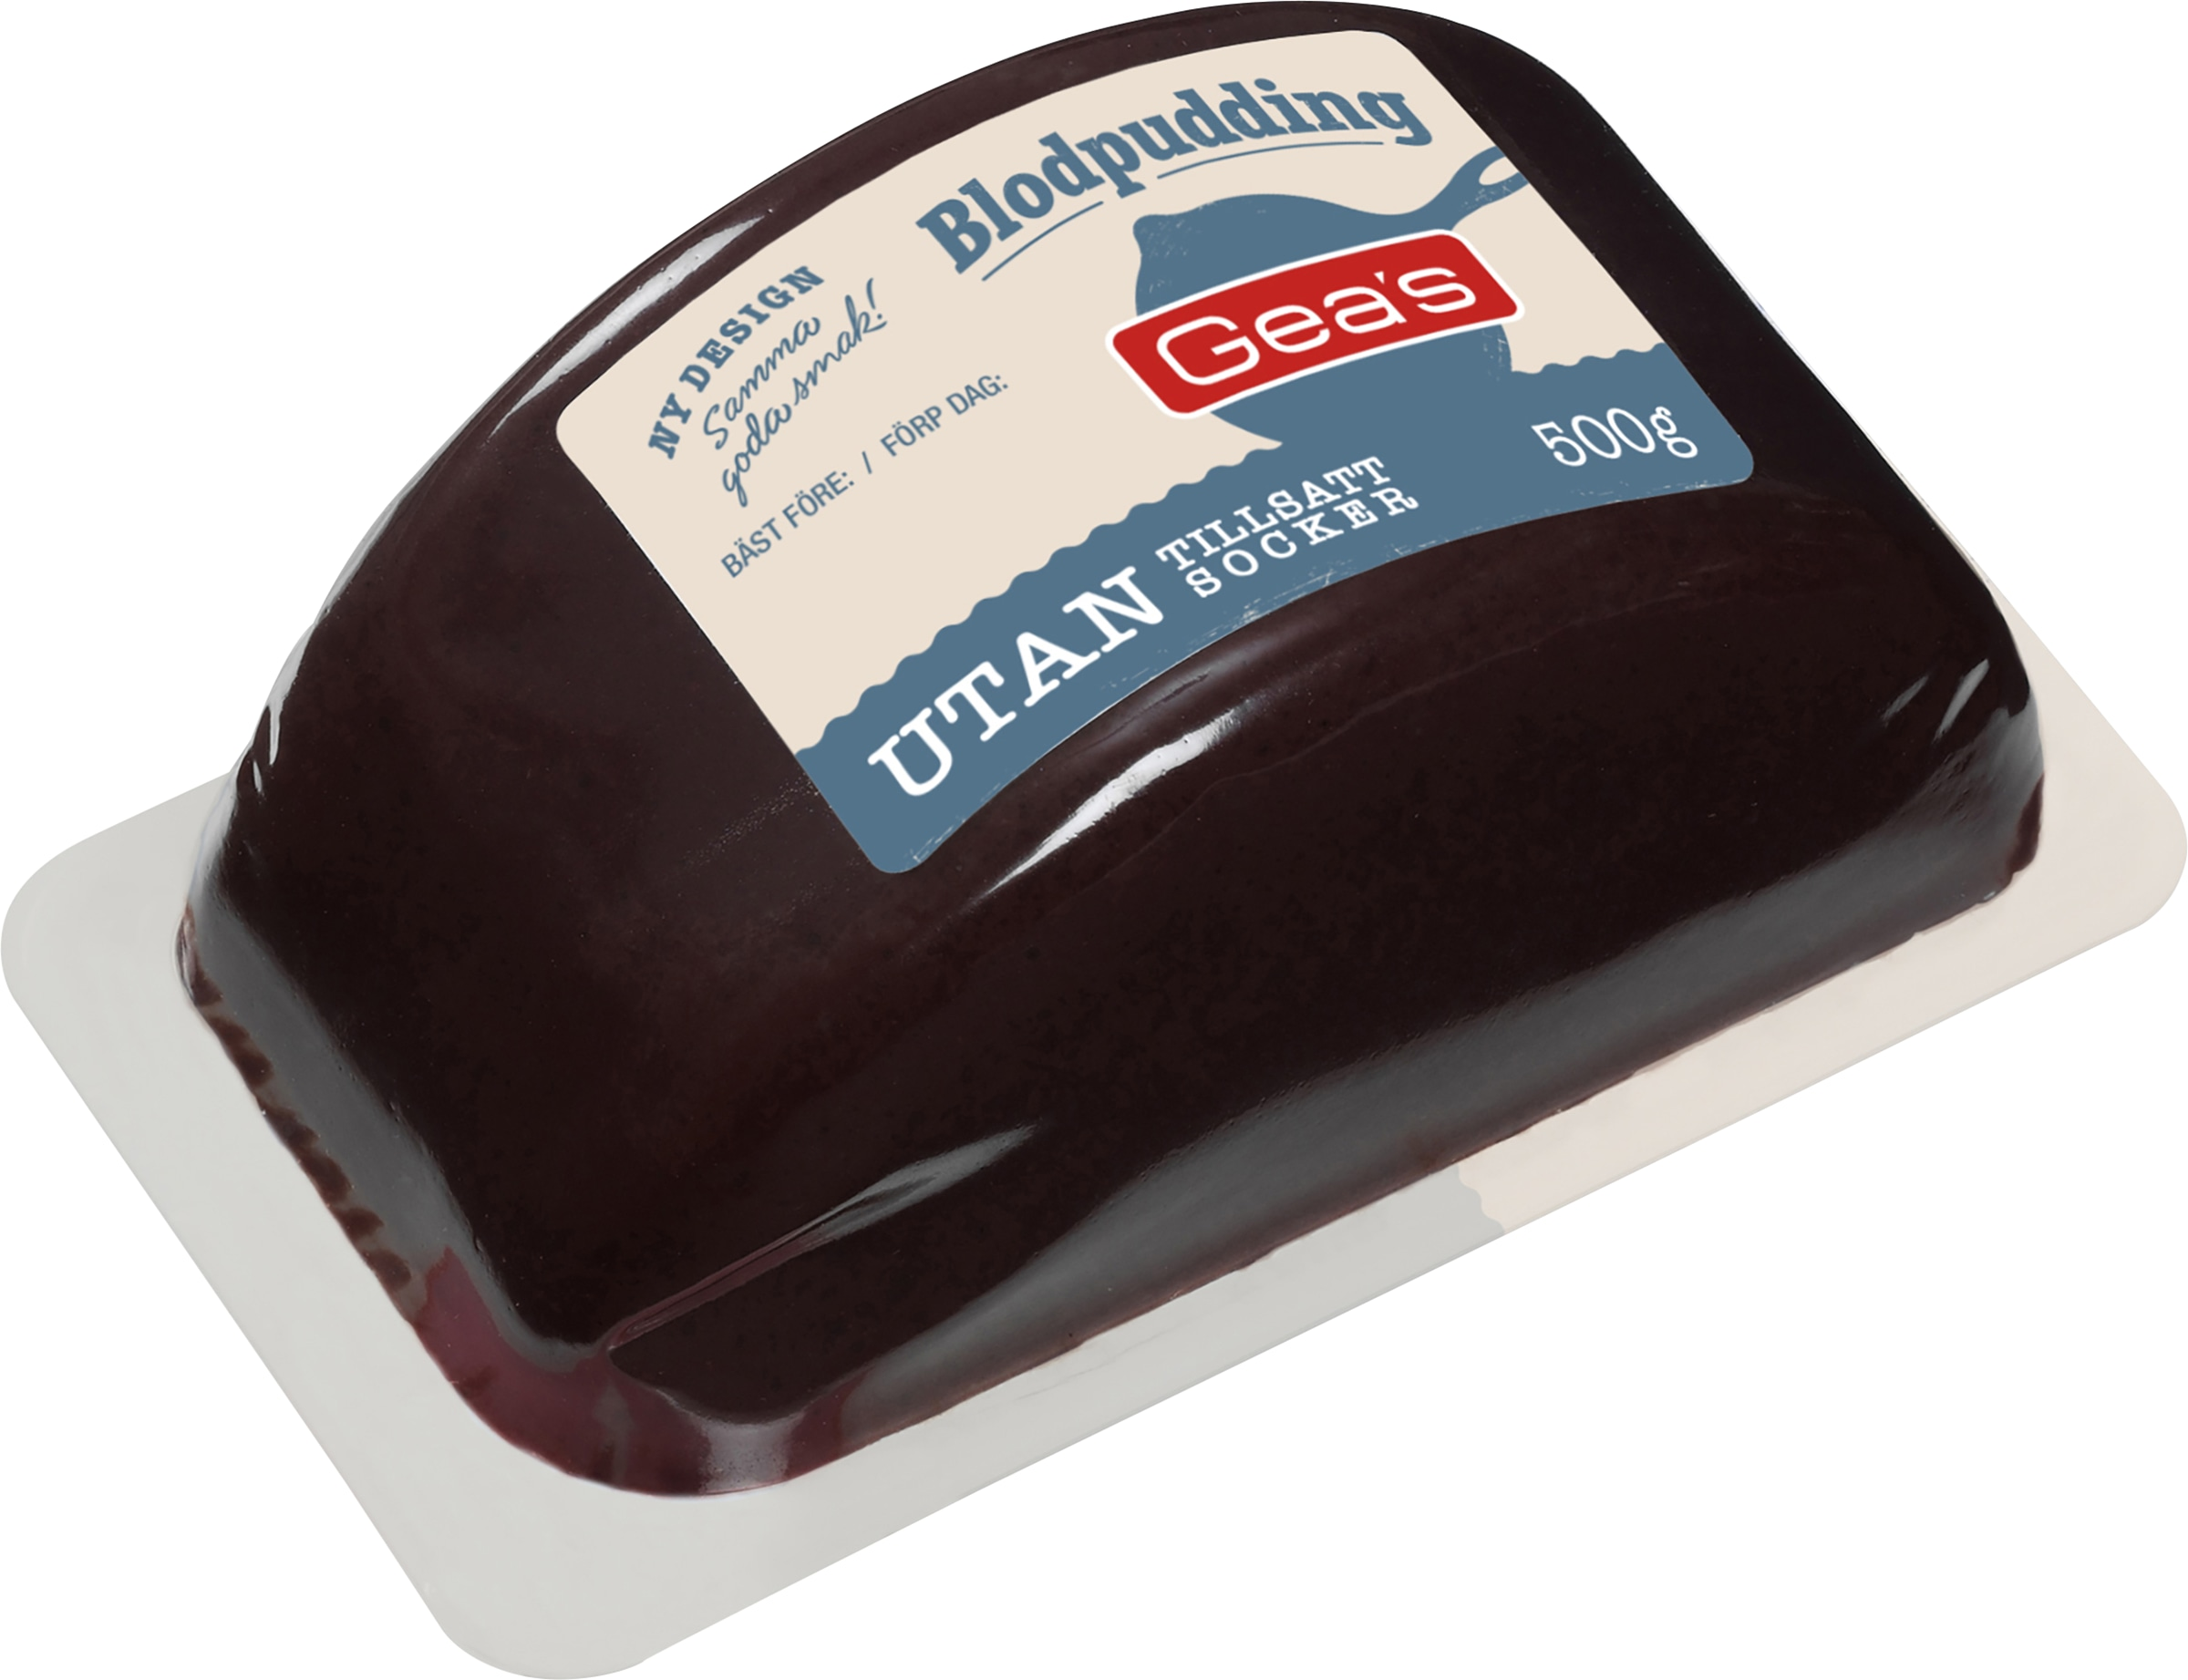 geas blodpudding utan socker